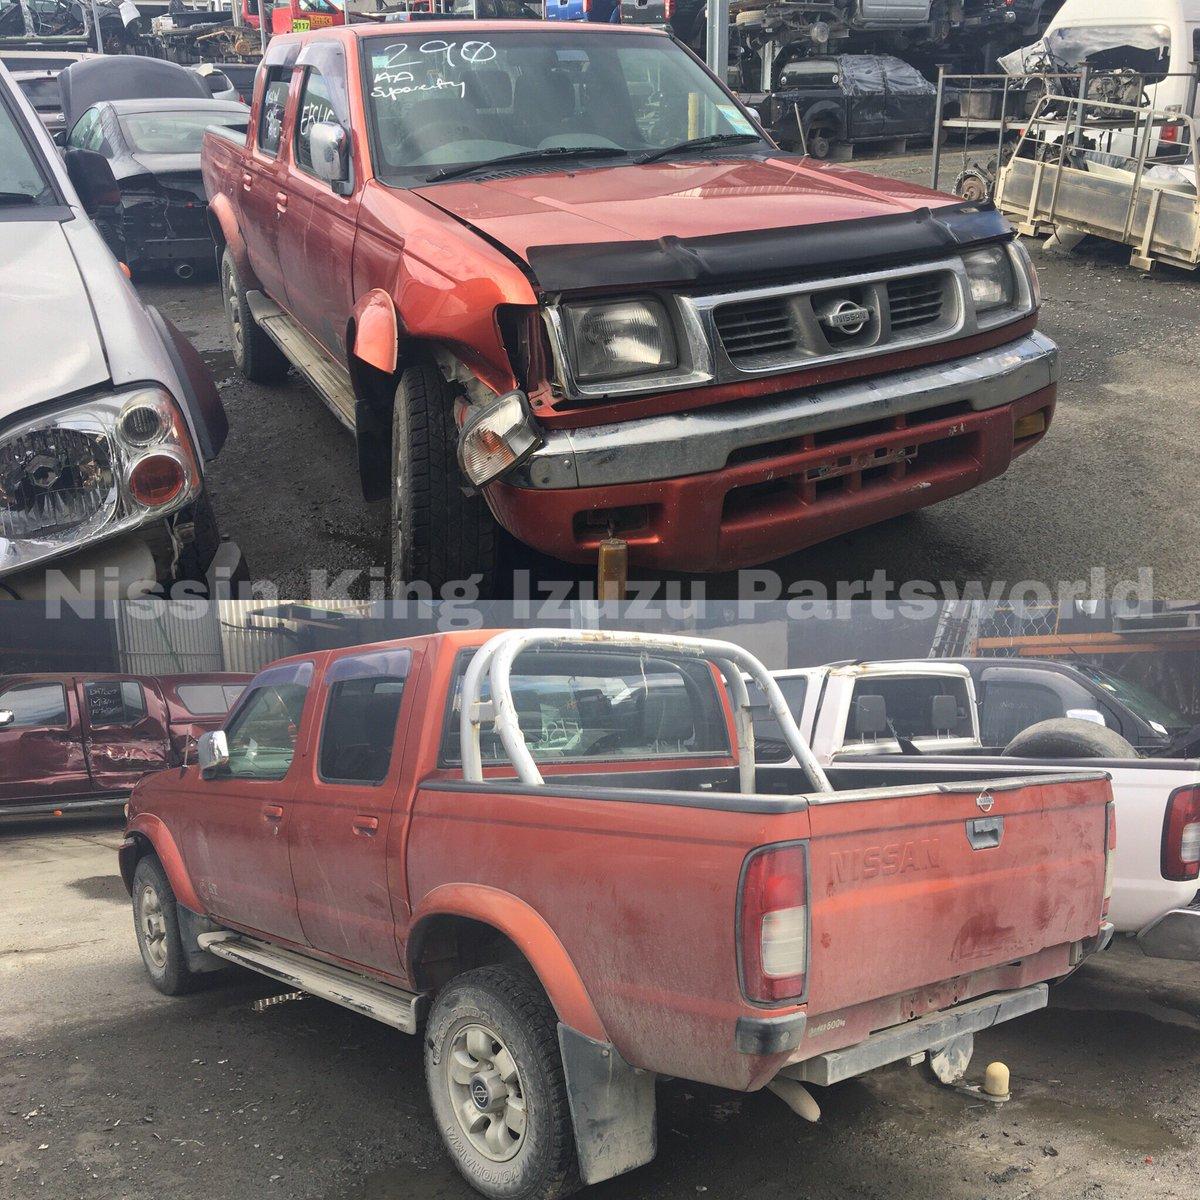 ... for #dismantling : - 2000 D22 #Nissan #Datsun AX-Limited (#Navara) -  3.2L Diesel (#QD32) - Manual Transmission - 4WD - RF damage, has good rear,  engine, ...